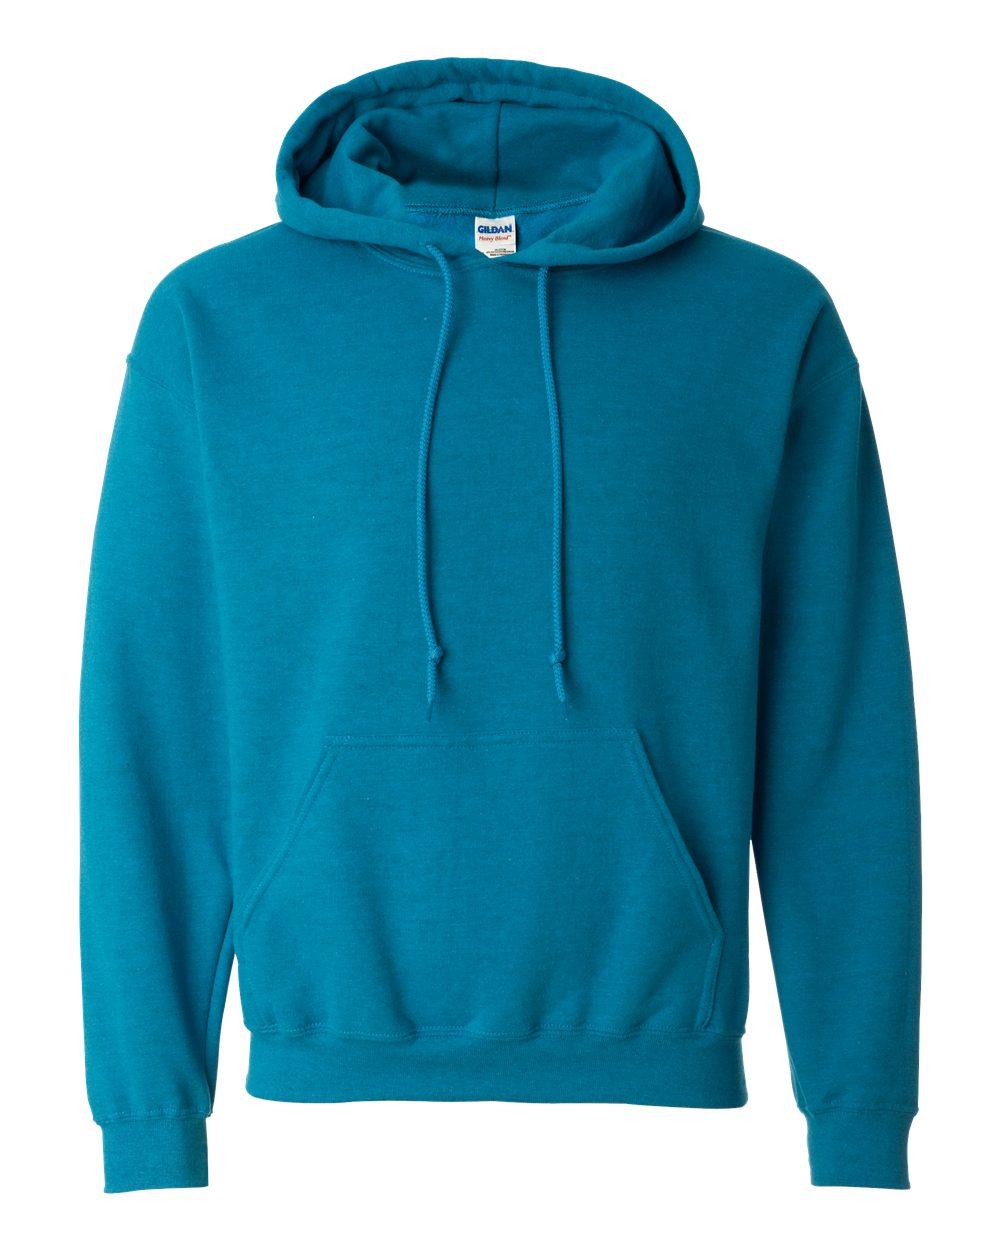 Gildan-Mens-Blank-Hoodie-Heavy-Blend-Hooded-Sweatshirt-18500-up-to-5XL thumbnail 9